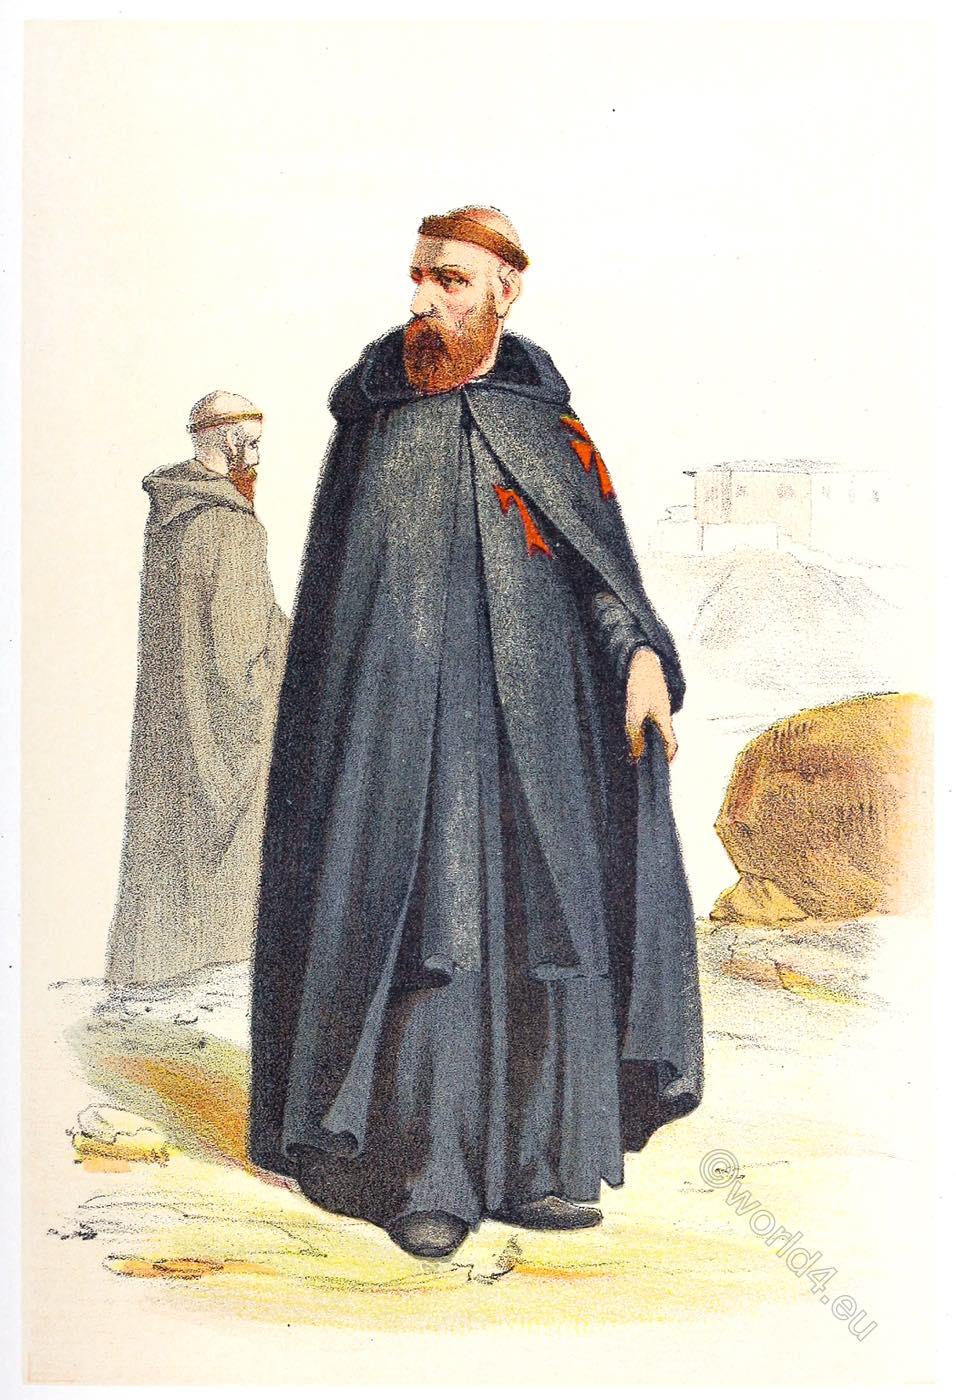 Armenian, monks, Basil, monastic, order, habit,